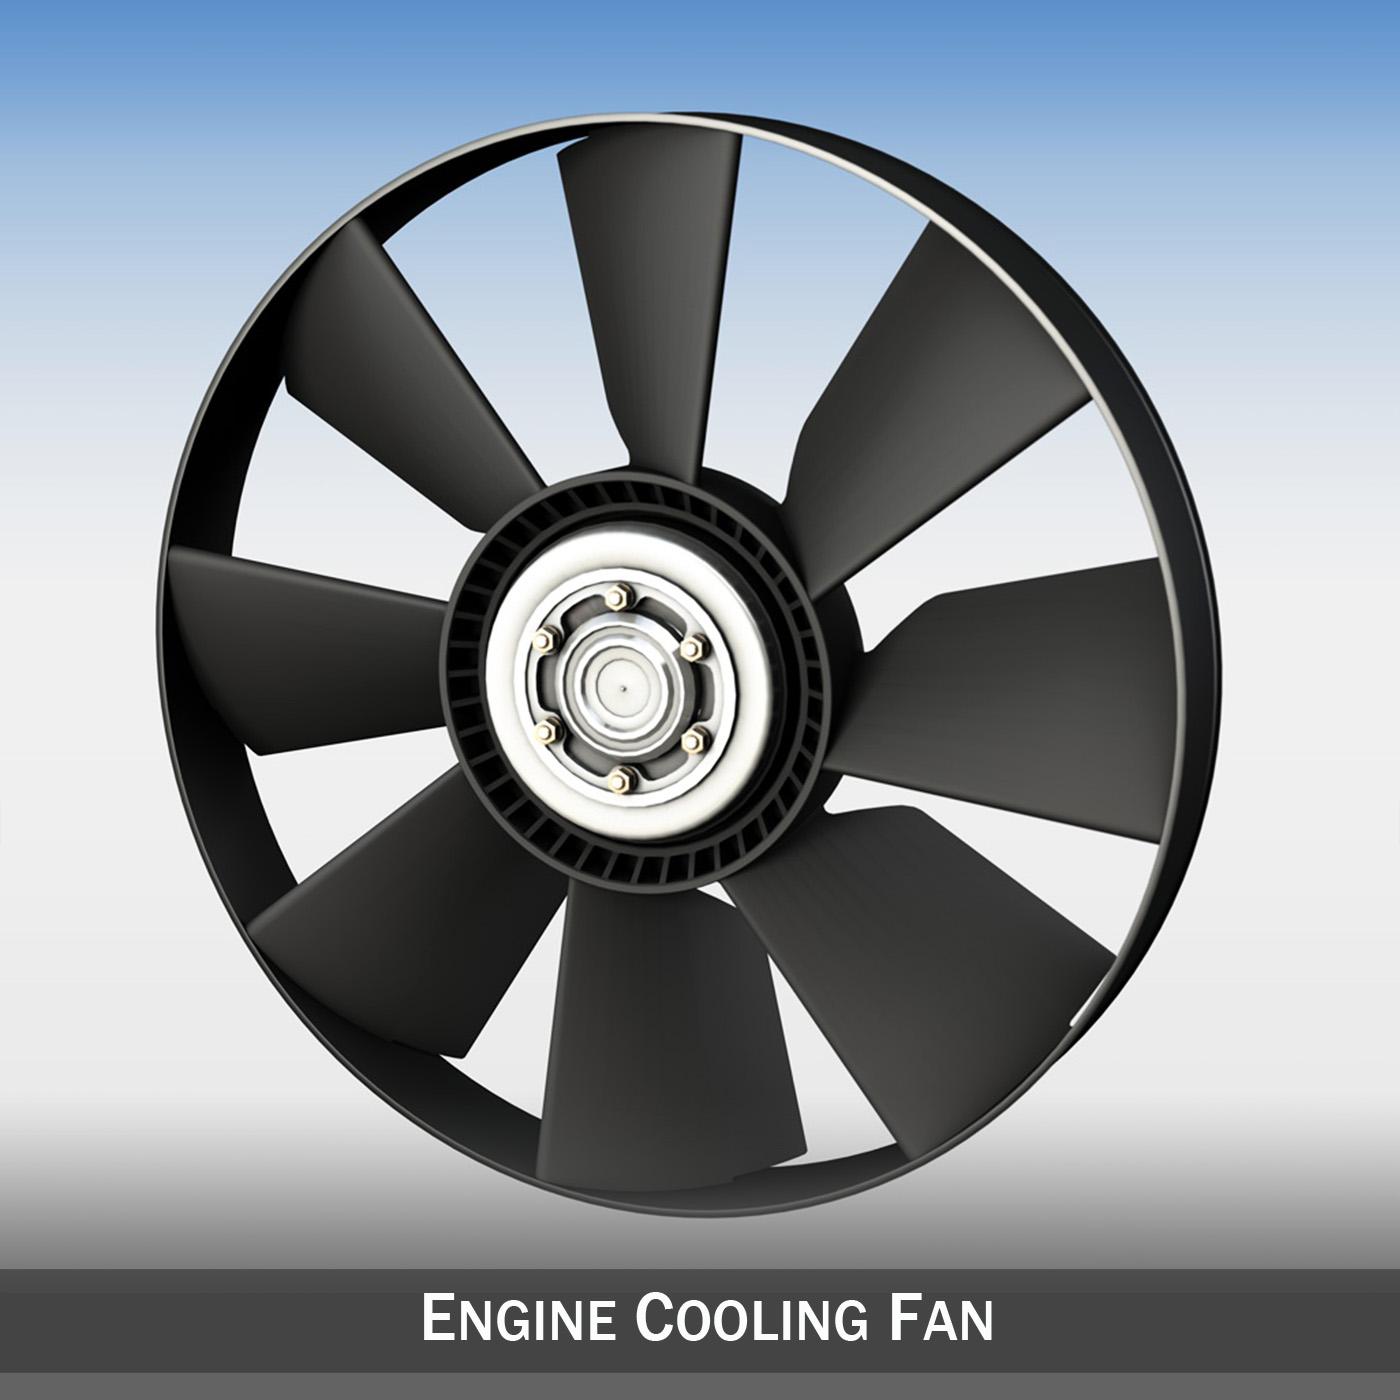 Engine cooling fan 3d model 3ds c4d lwo lws lw obj 264180